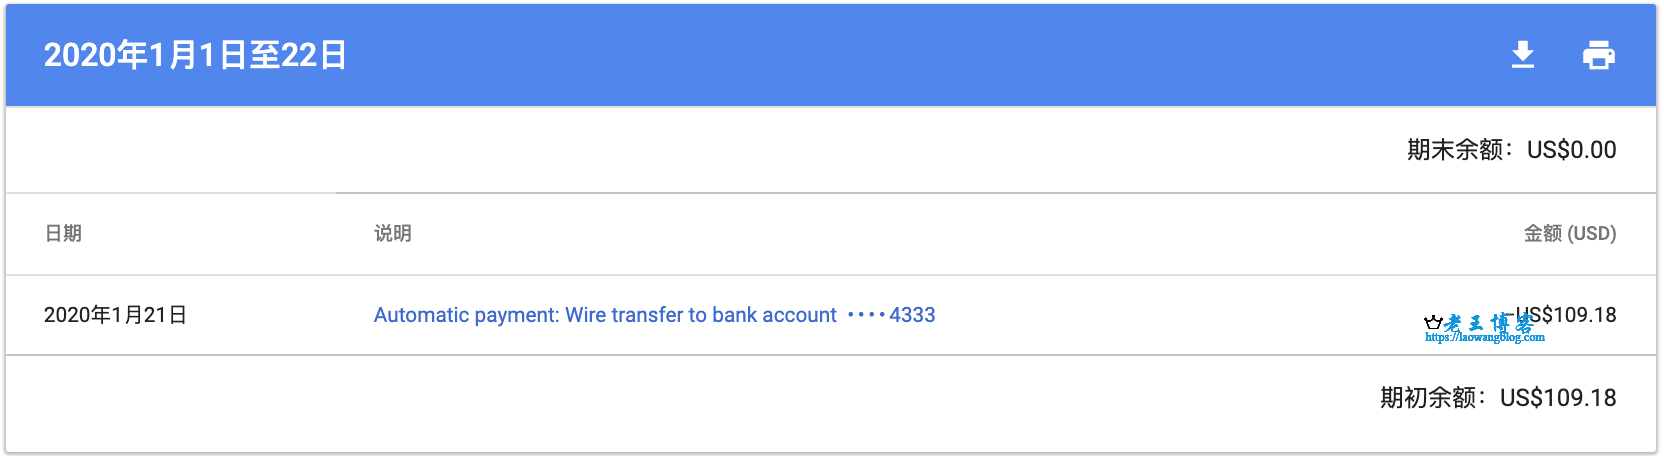 Google Adsense 电汇方式收款付款时间